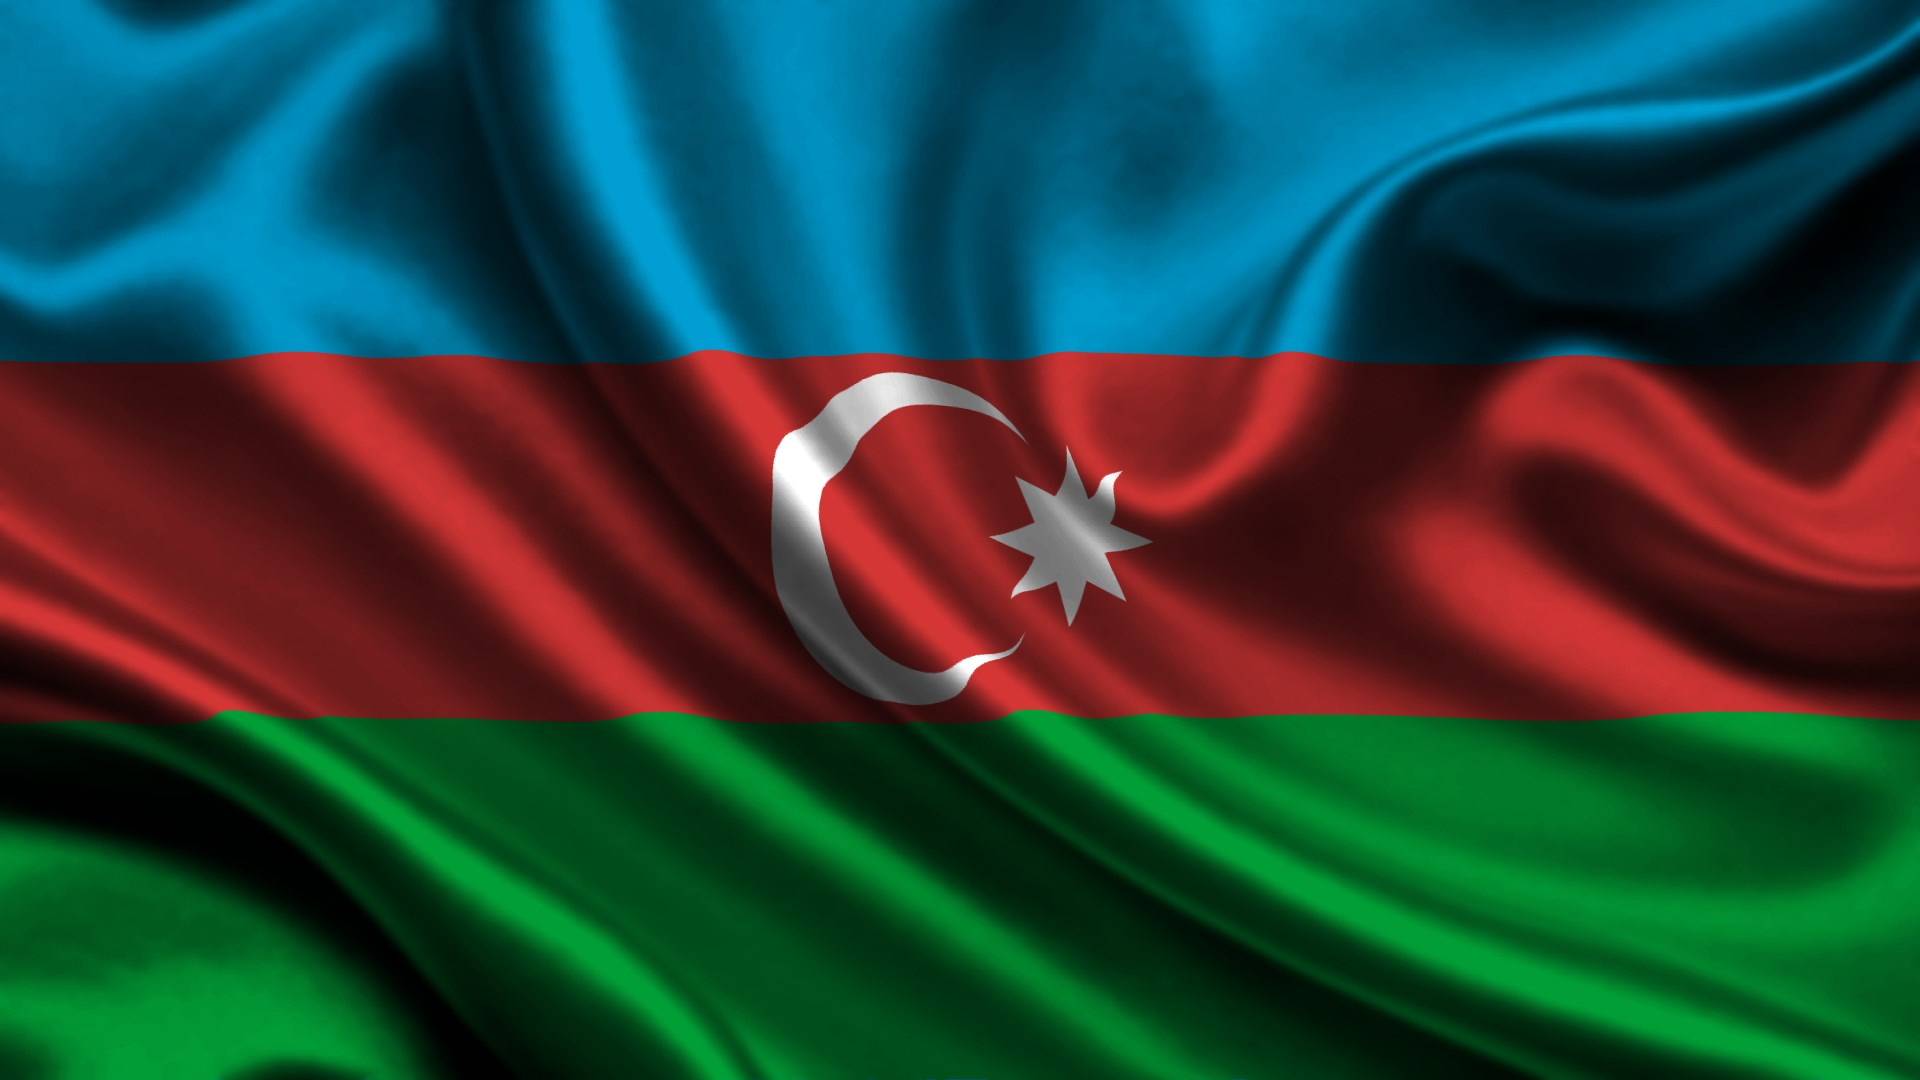 1920x1080-px-flag-of-azerbaijan-for-mac-computers-by-Jasper-Walls-wallpaper-wp340882